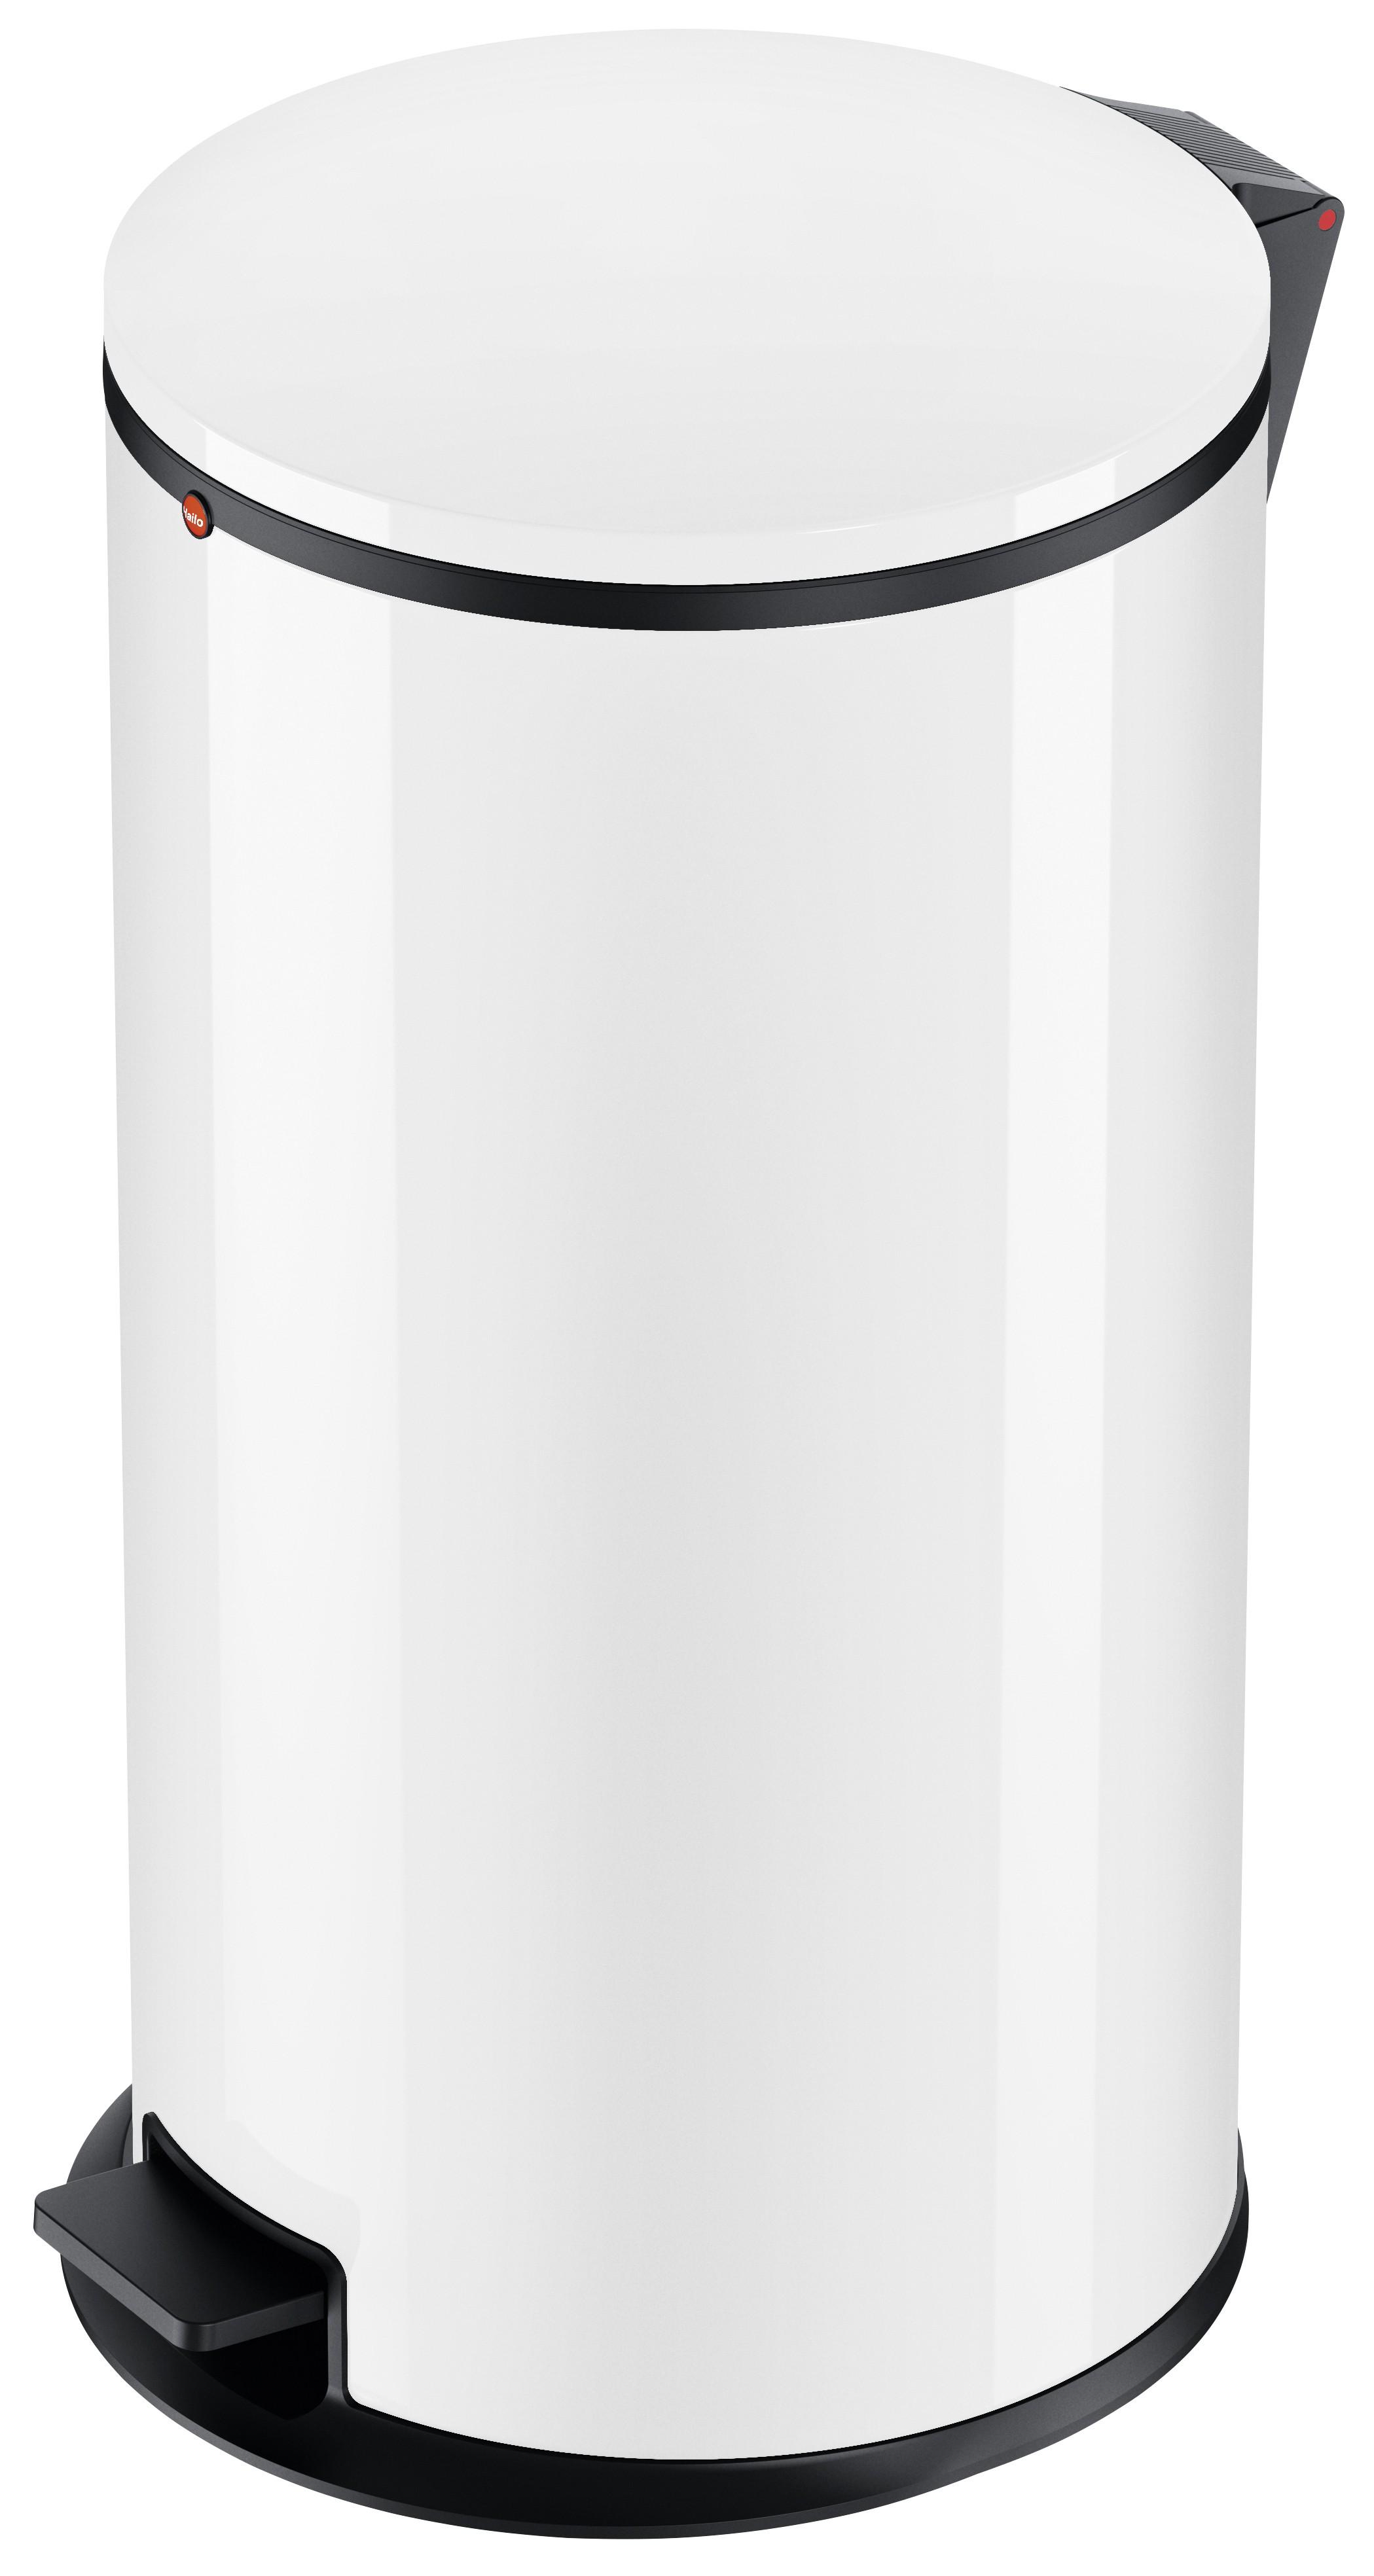 Hailo Pure XL, Stahlblech weiß, 44 Liter, Inneneimer: verzinkt, Tret-Abfallsammler